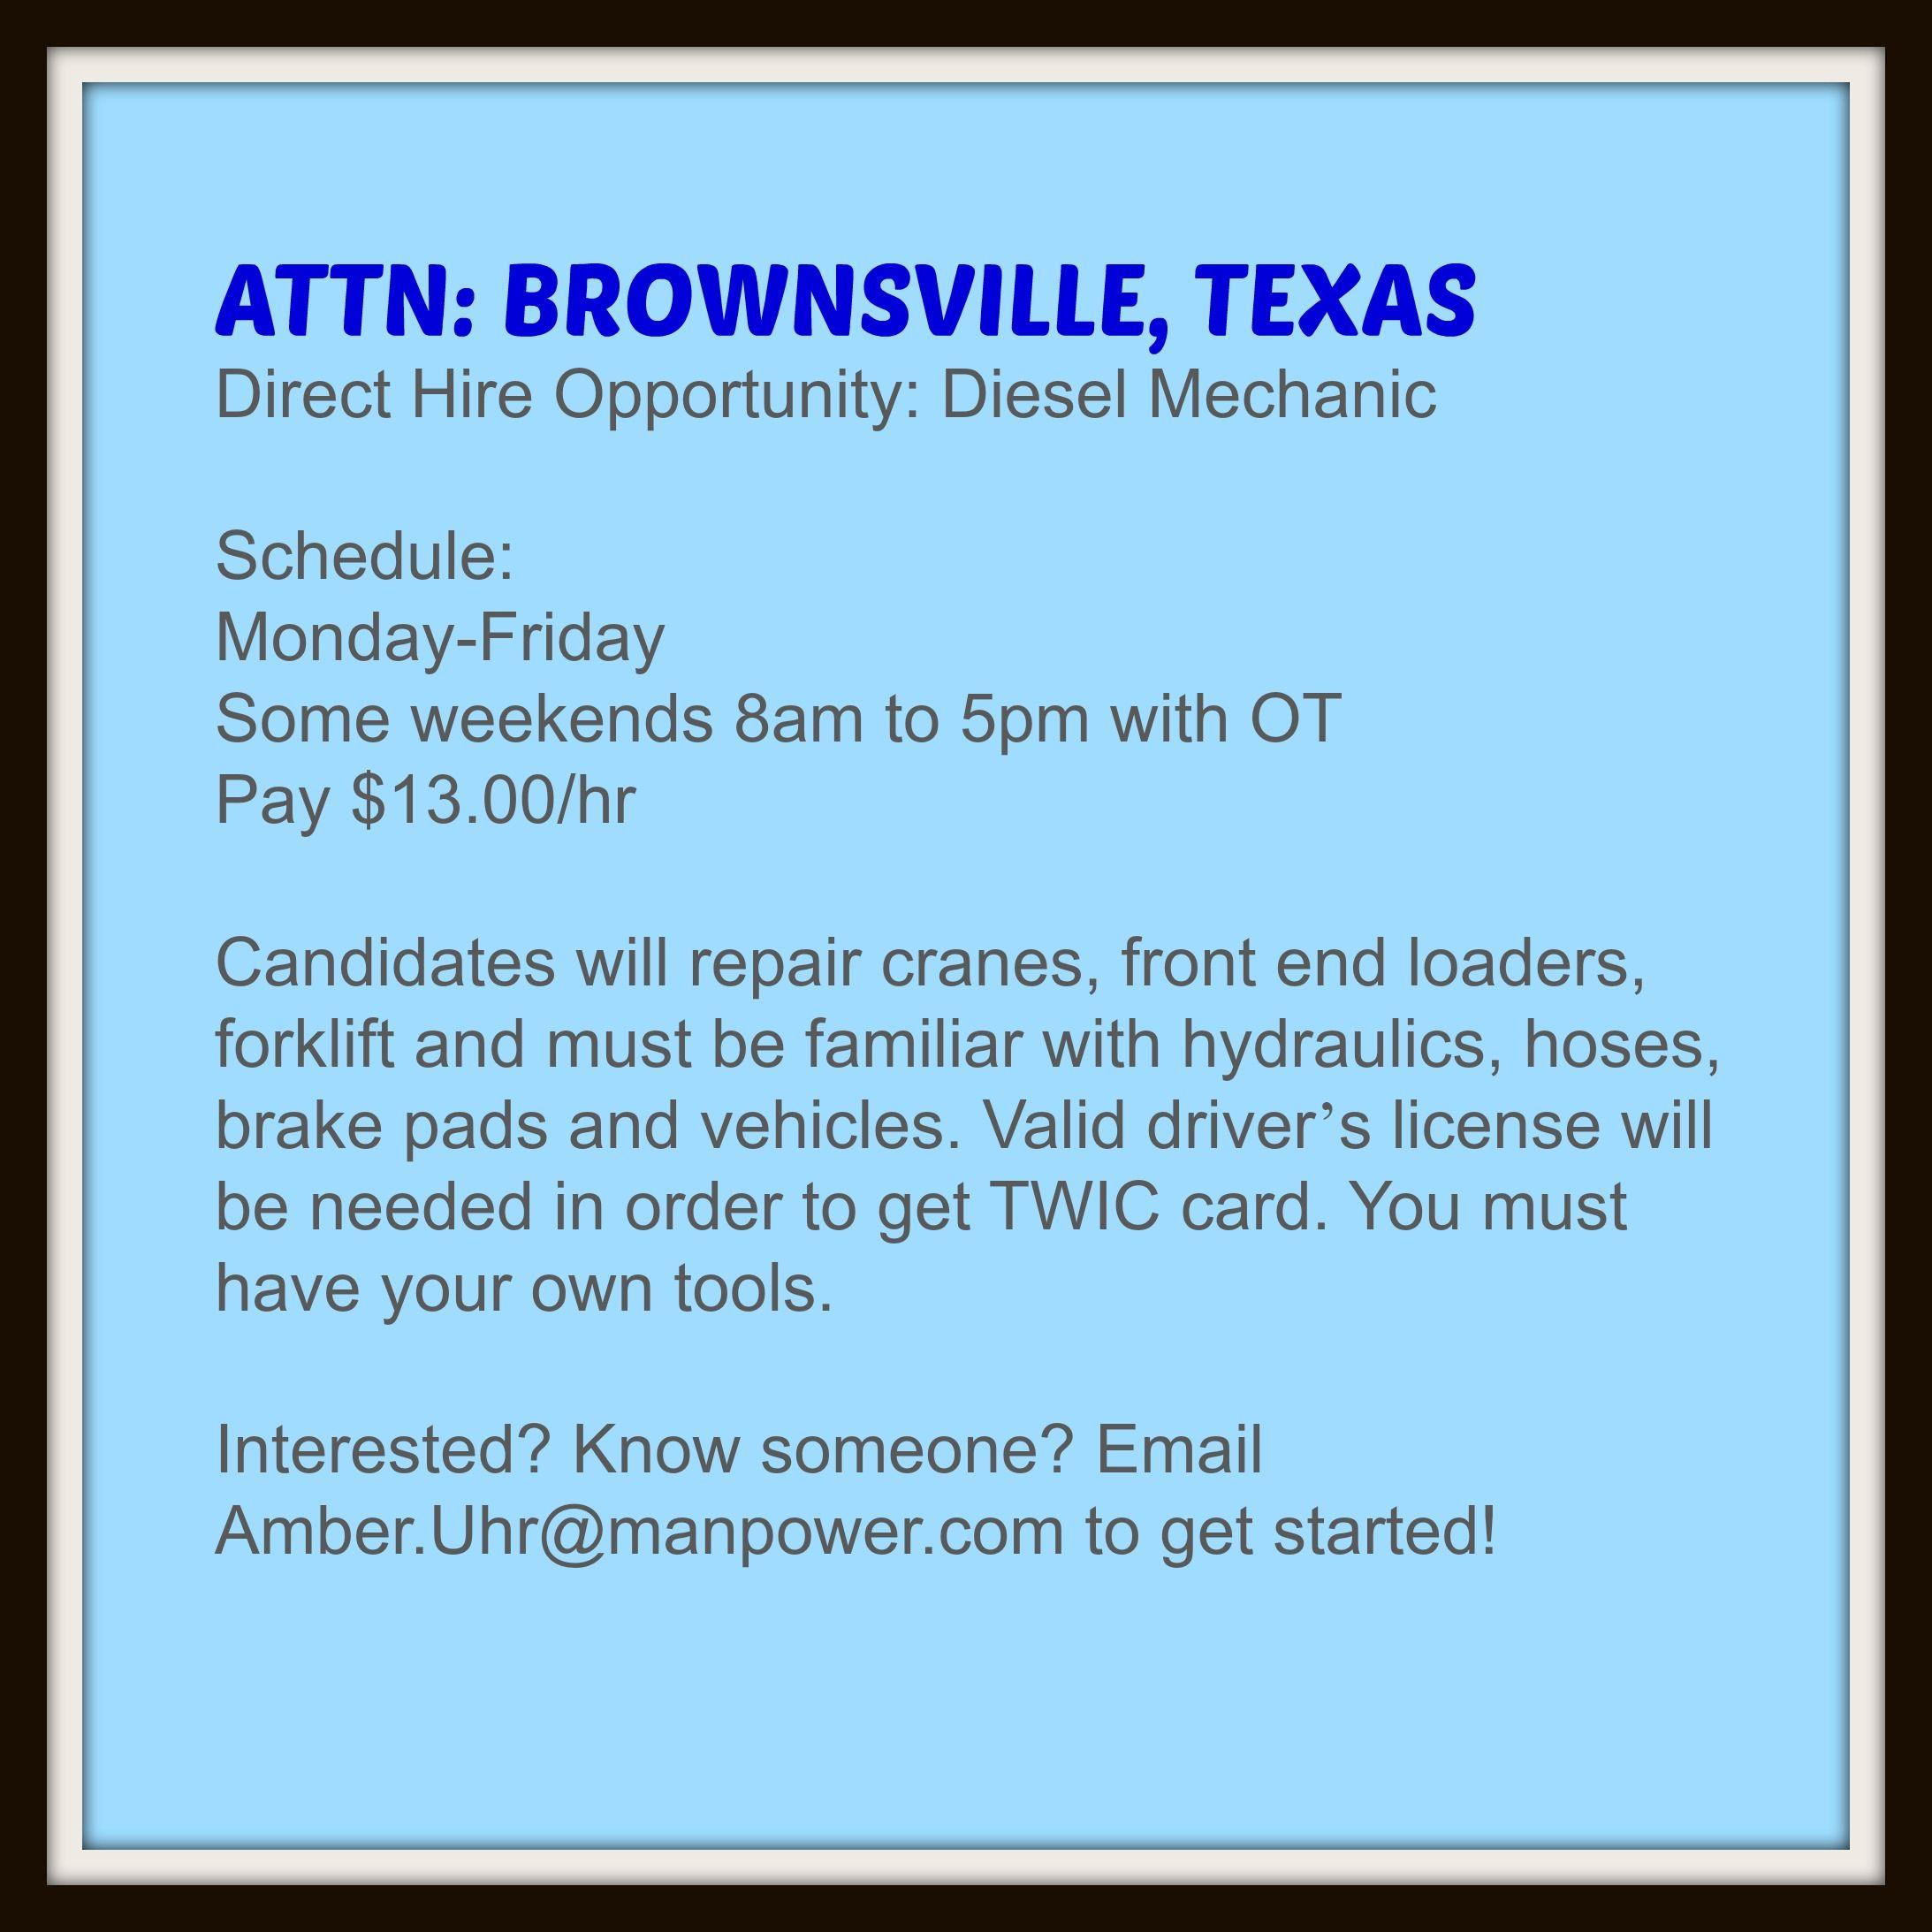 ATTN BROWNSVILLE, TEXAS Direct Hire Opportunity Diesel